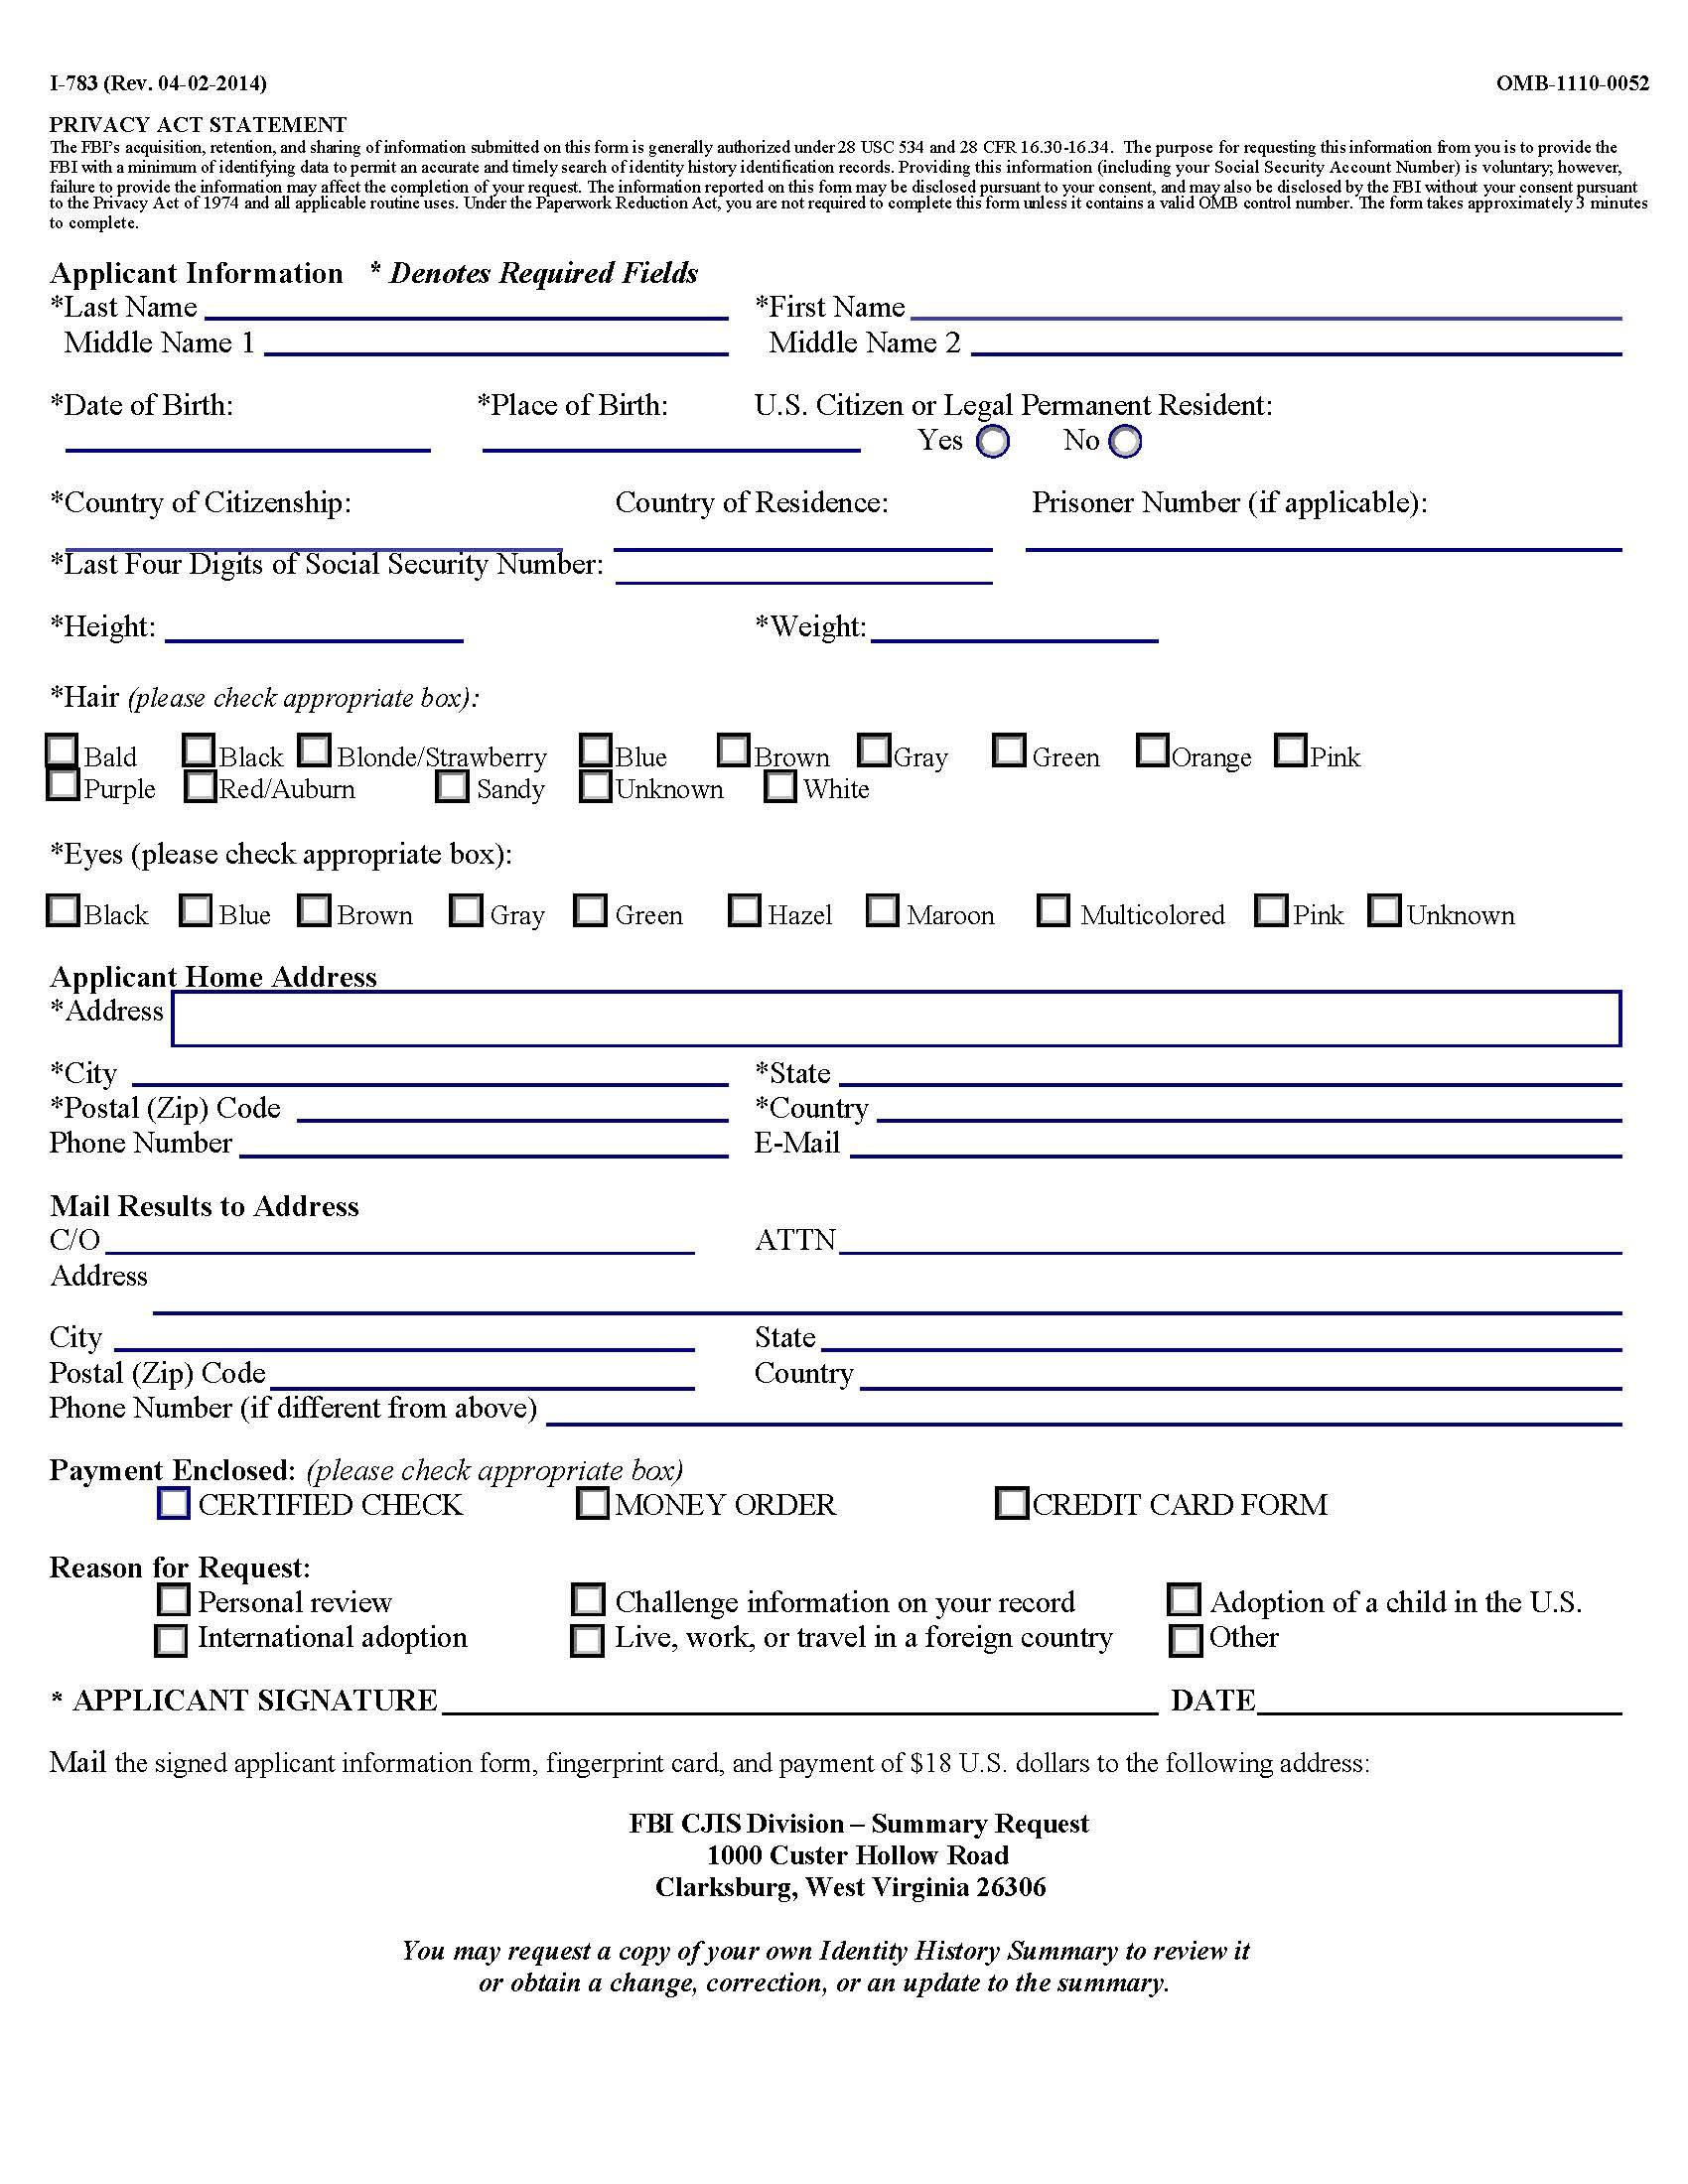 How to get fbi background check apostille step 1 application information form falaconquin